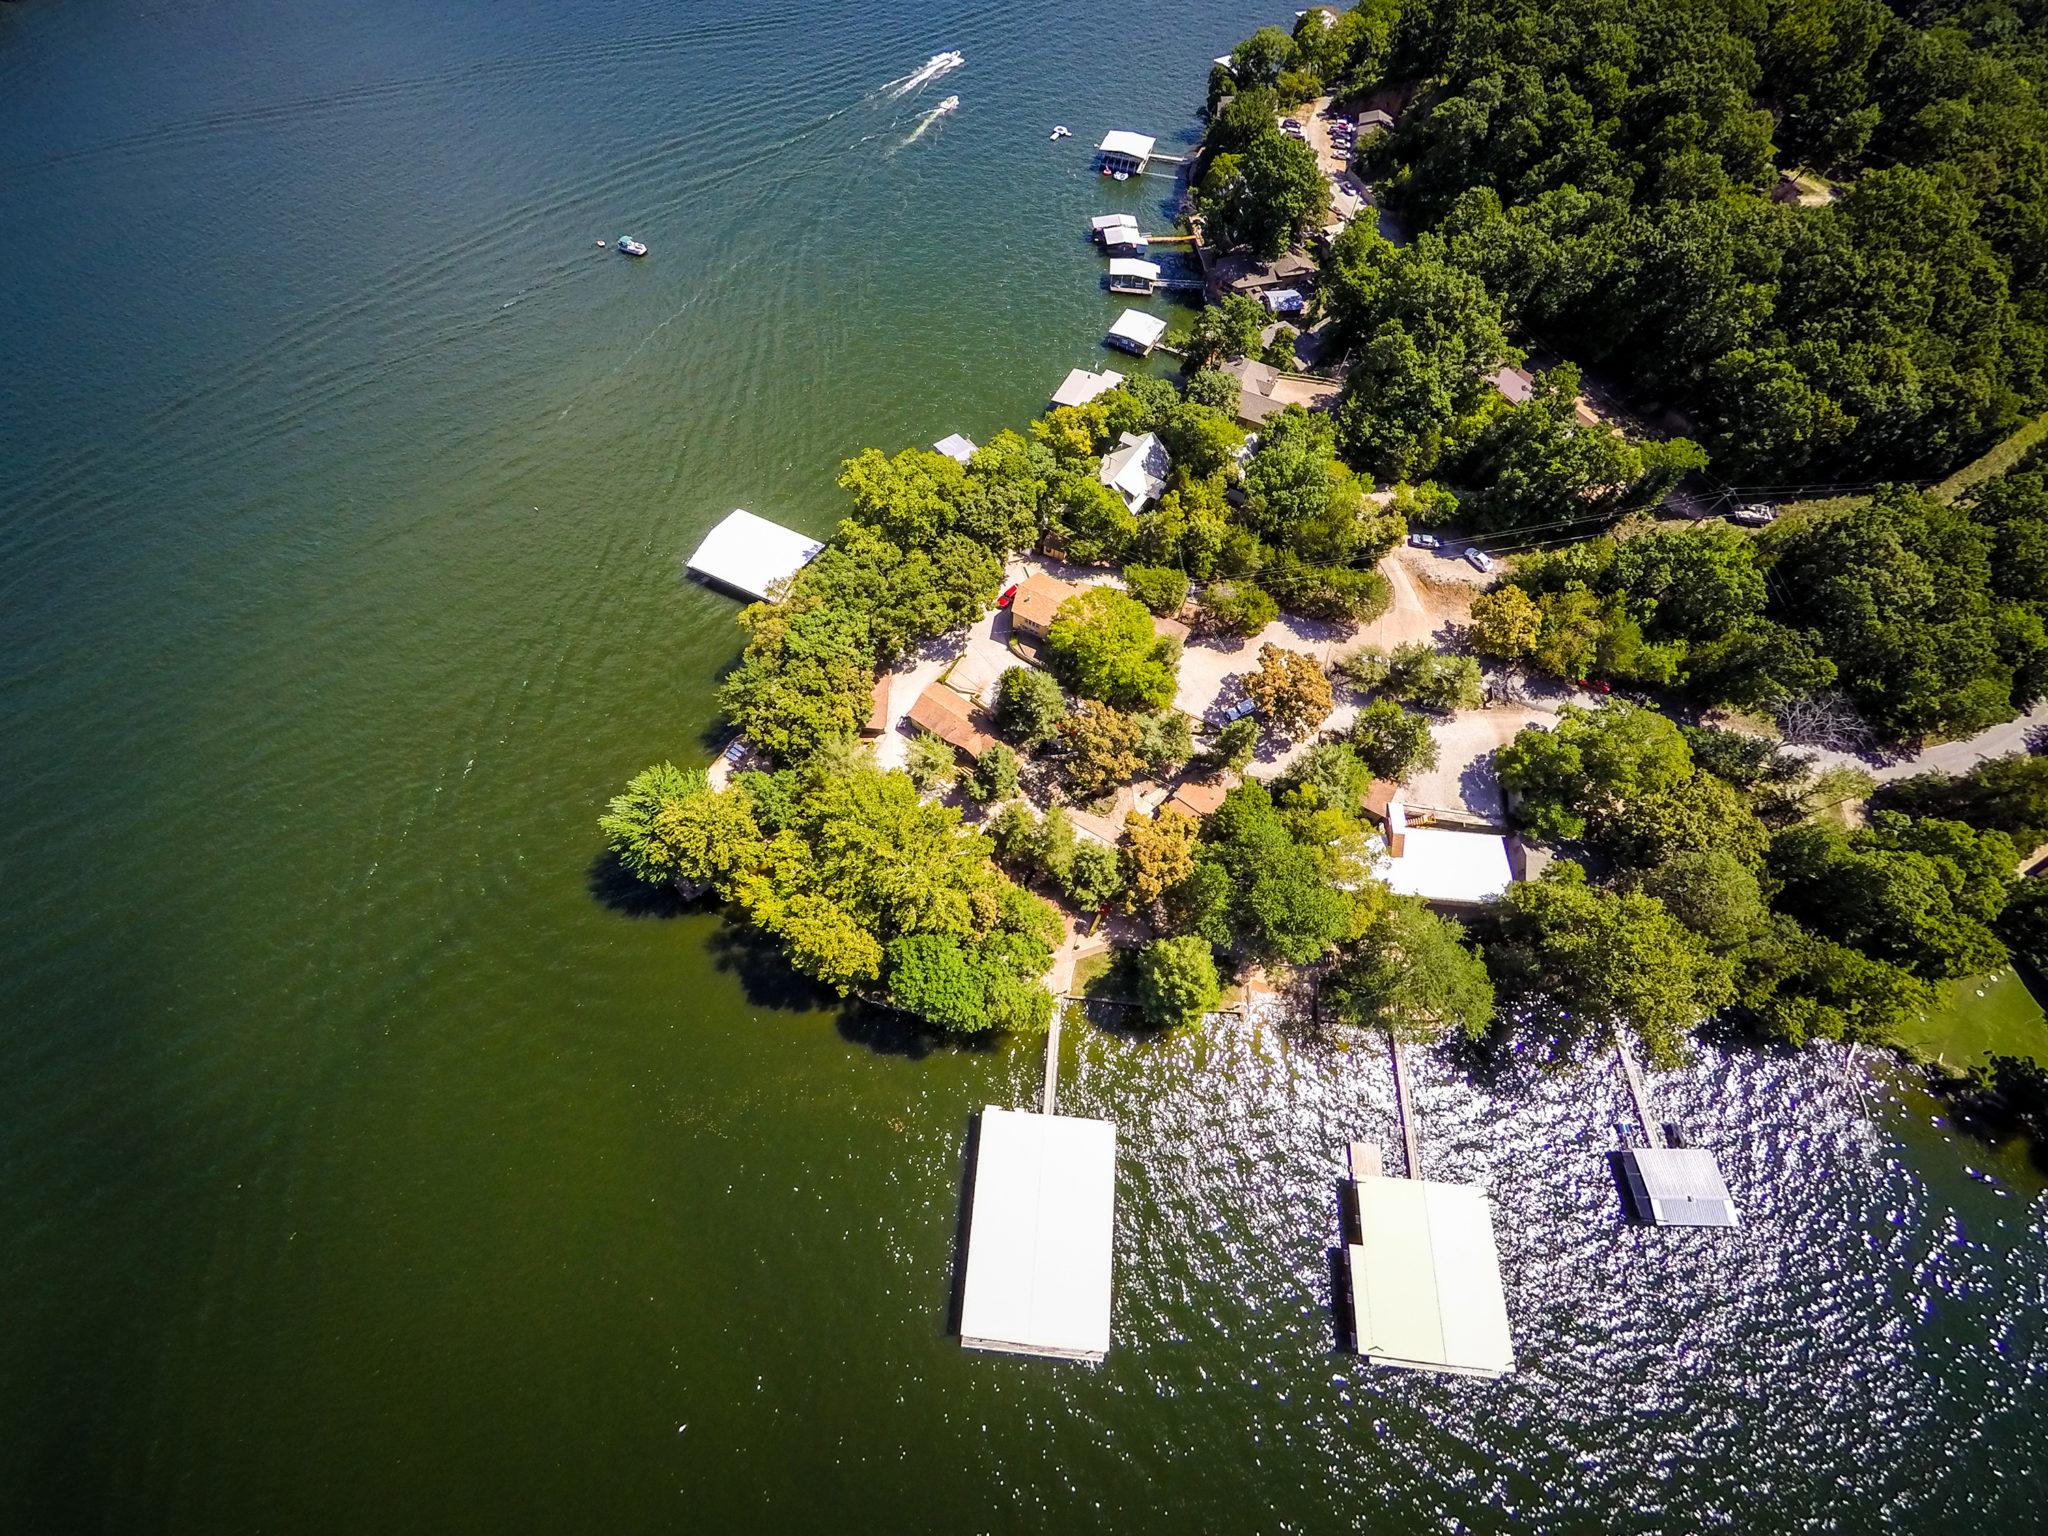 Point View Resort